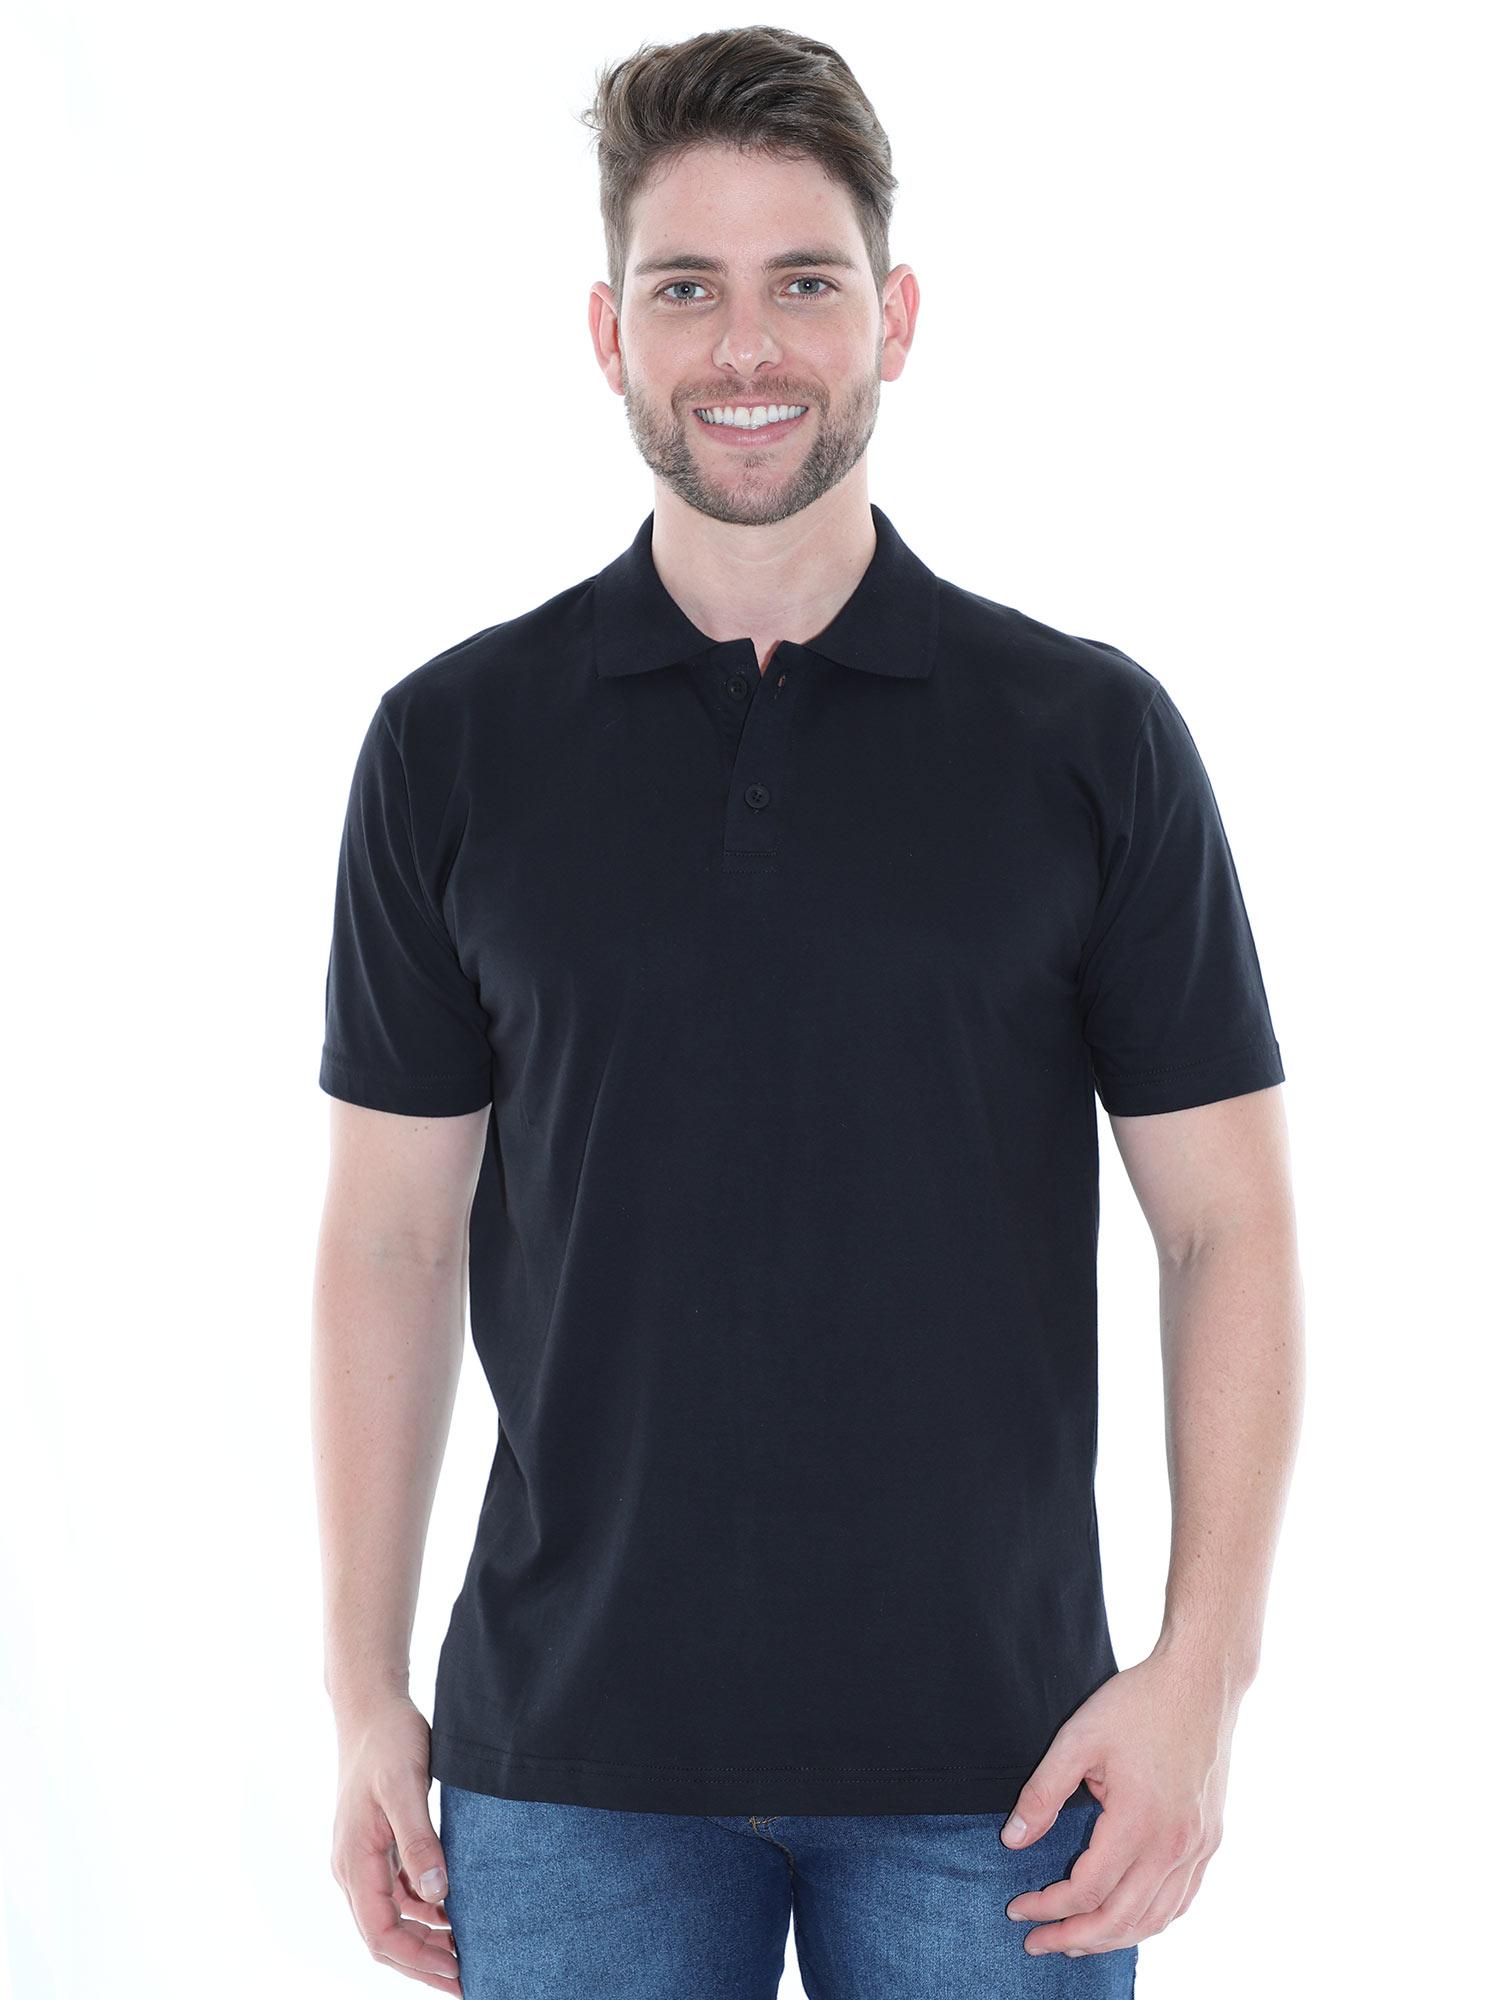 Camisa Polo Masculina Básica Algodão Lisa Conforto Preto